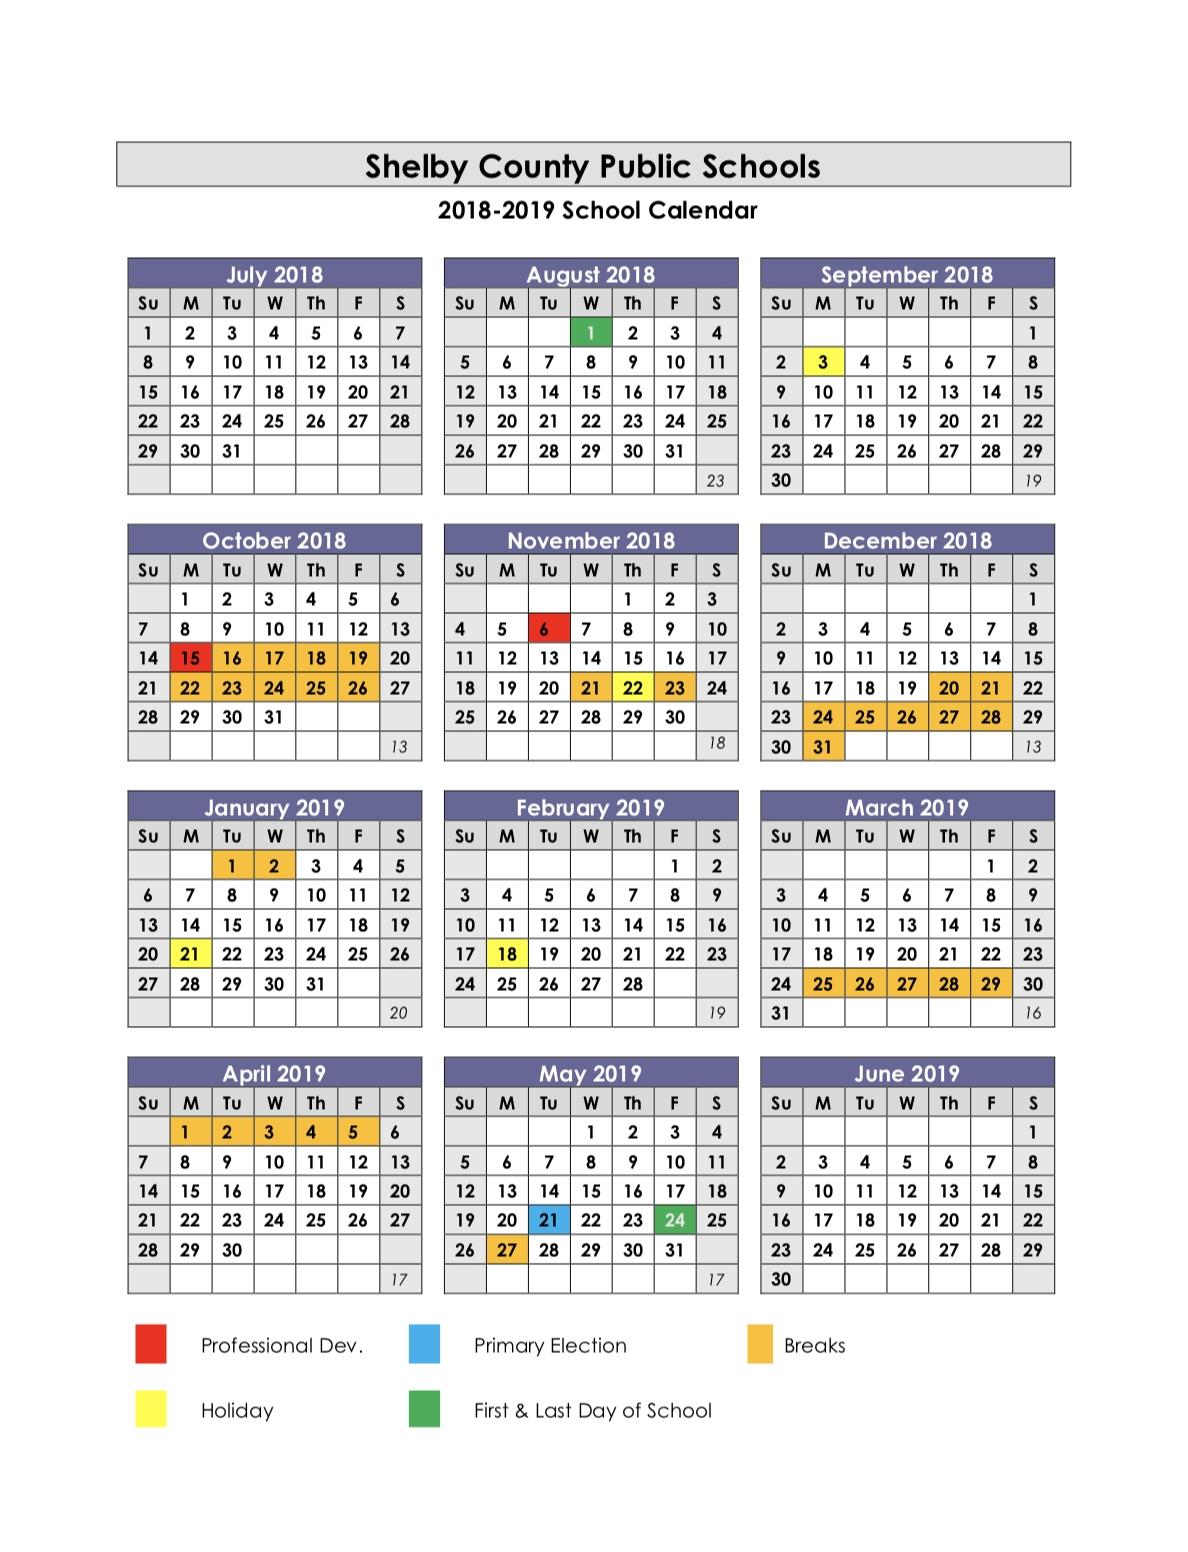 School Year Calendars / 2018 2019 School Calendar Calendar 2019 School